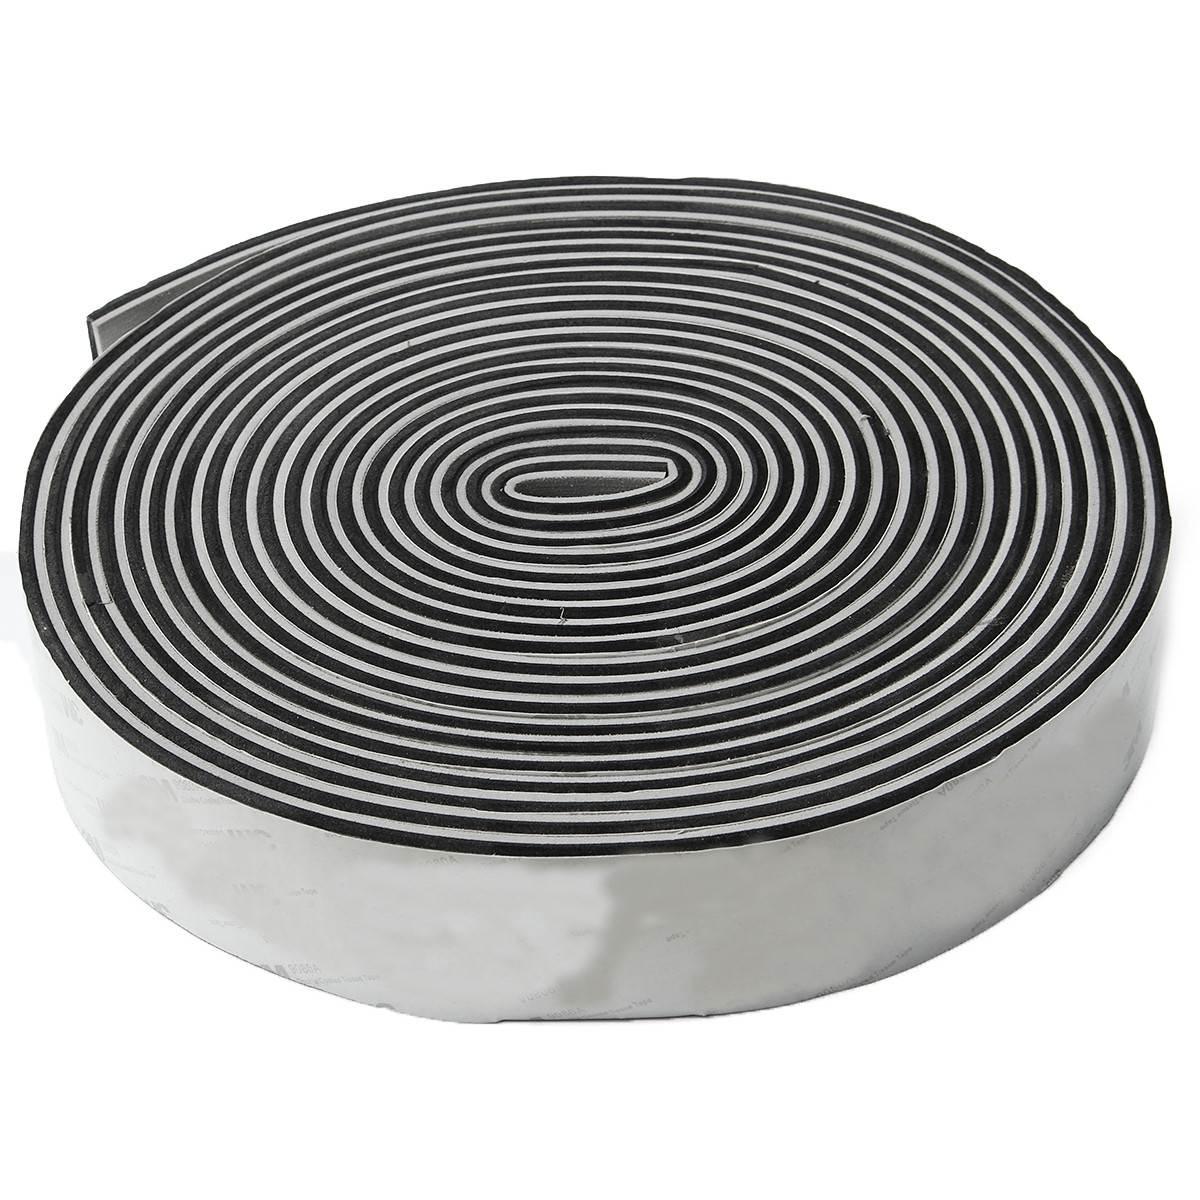 950x5.8cm 5mm Dark Gray Boat <font><b>Flooring</b></font> Teak Decking Carpet Yacht Sheet Pad Touring Car Mat